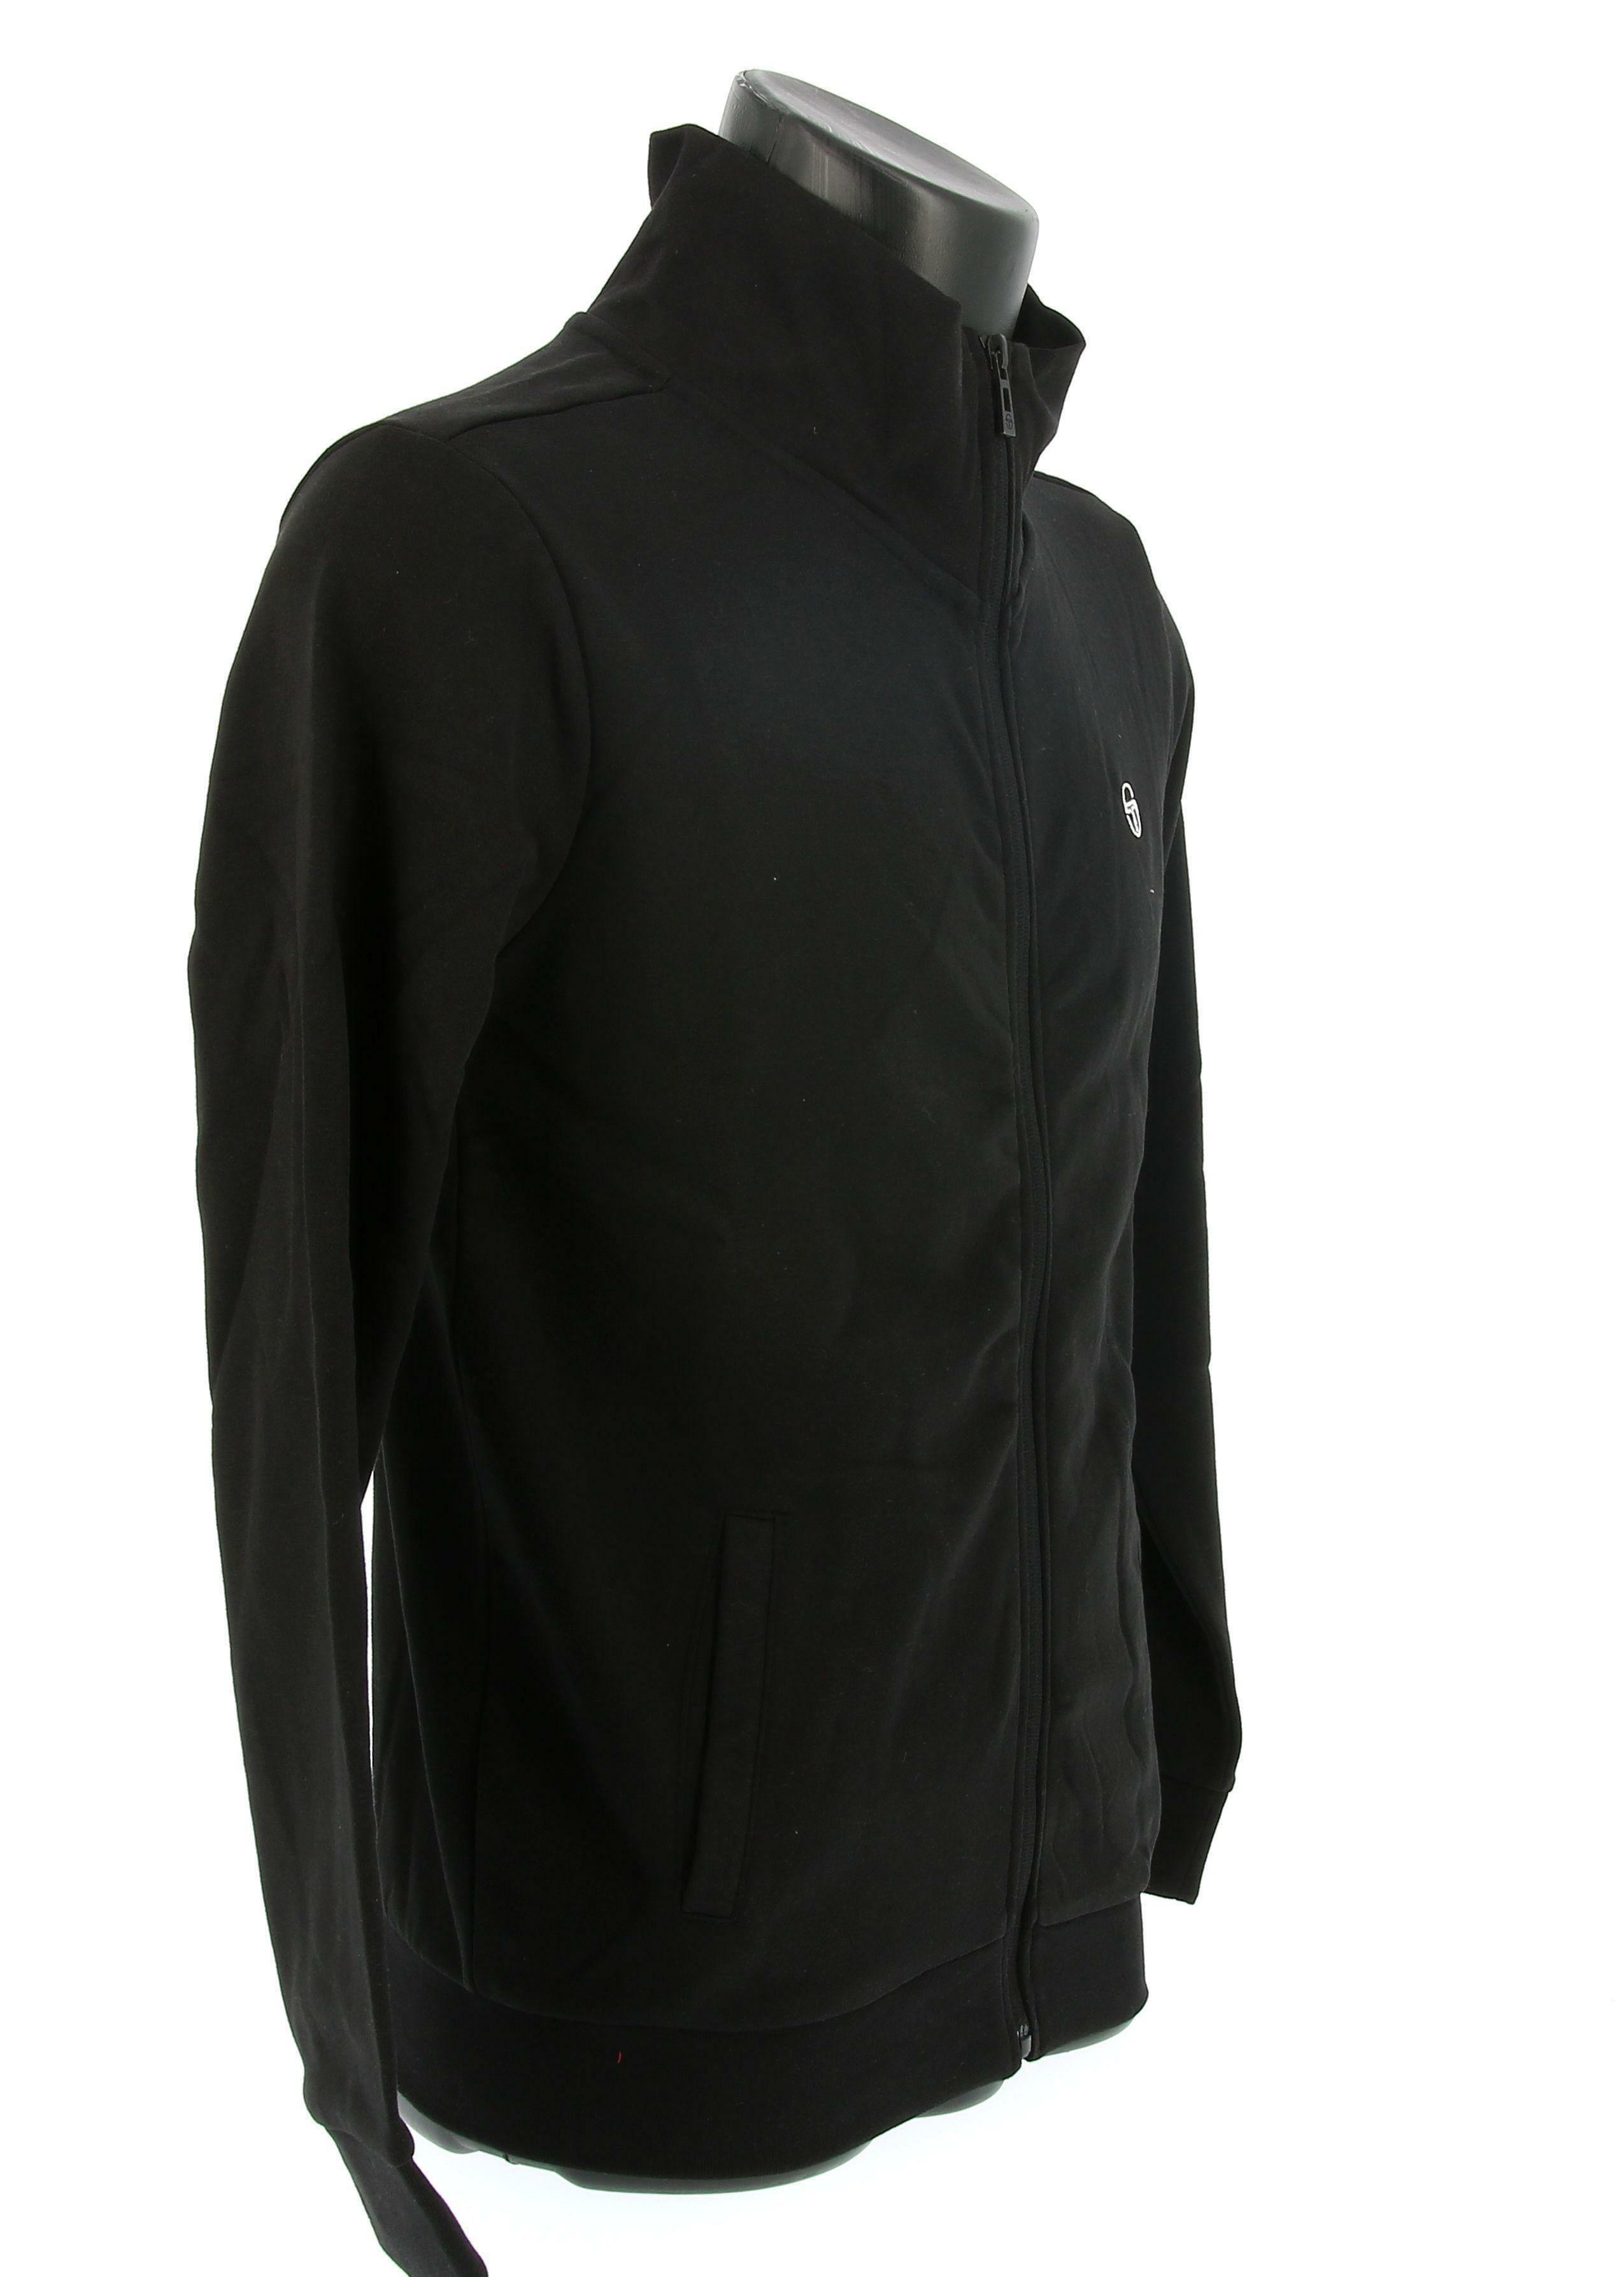 sergio tacchini felpa sergio tacchini 10012 sweater full zip jacket uomo nero